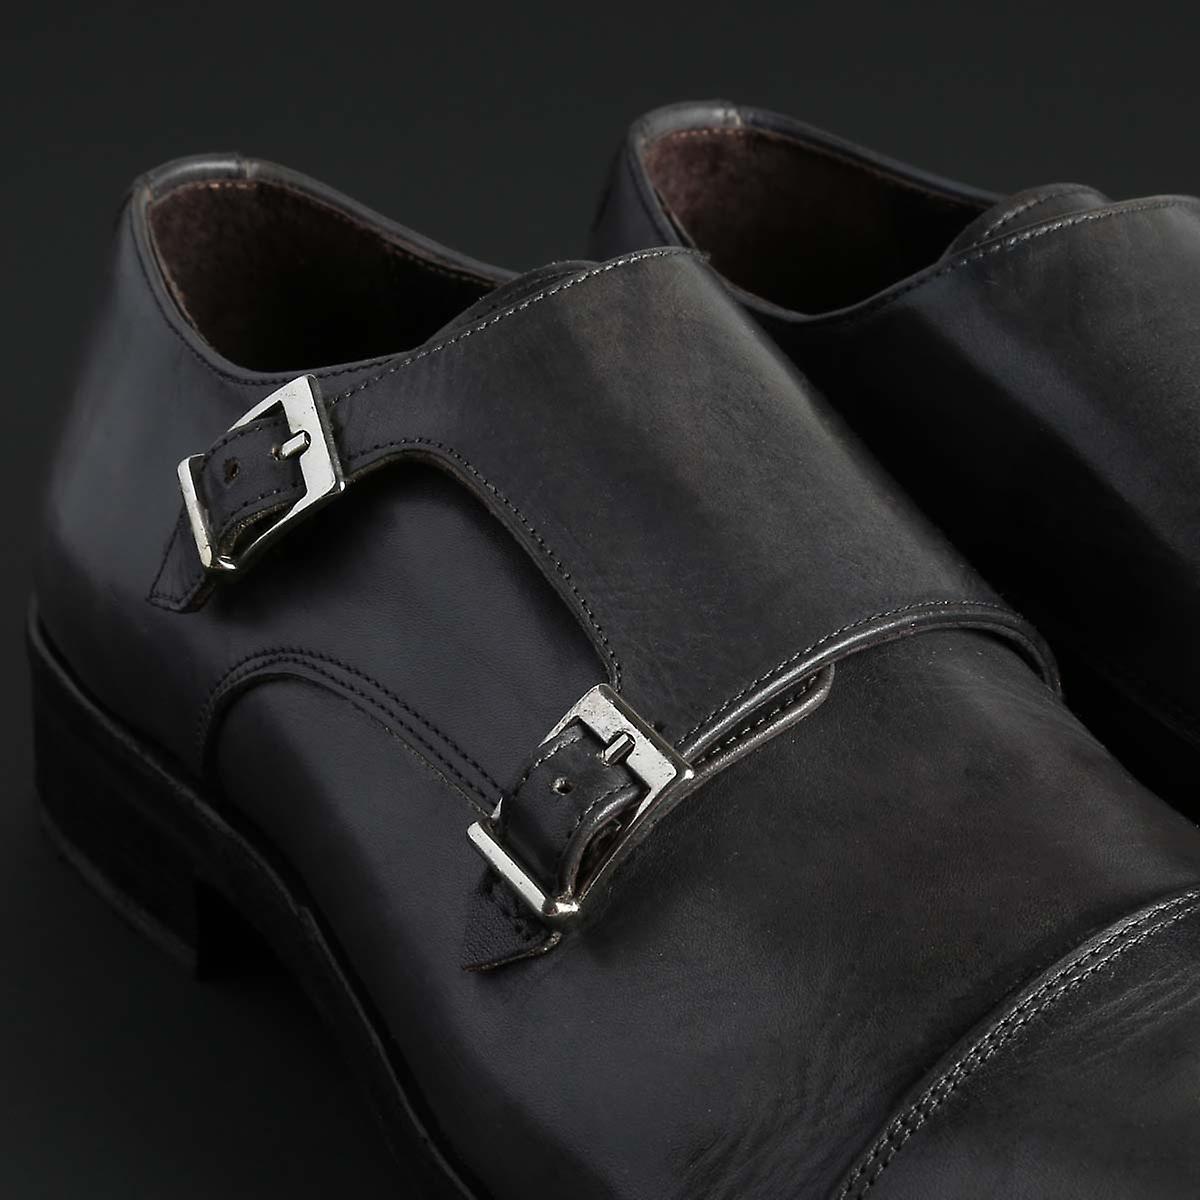 Duca Di Morrone Original Menn Hele Året Flat Shoe - Grå Farge 32744